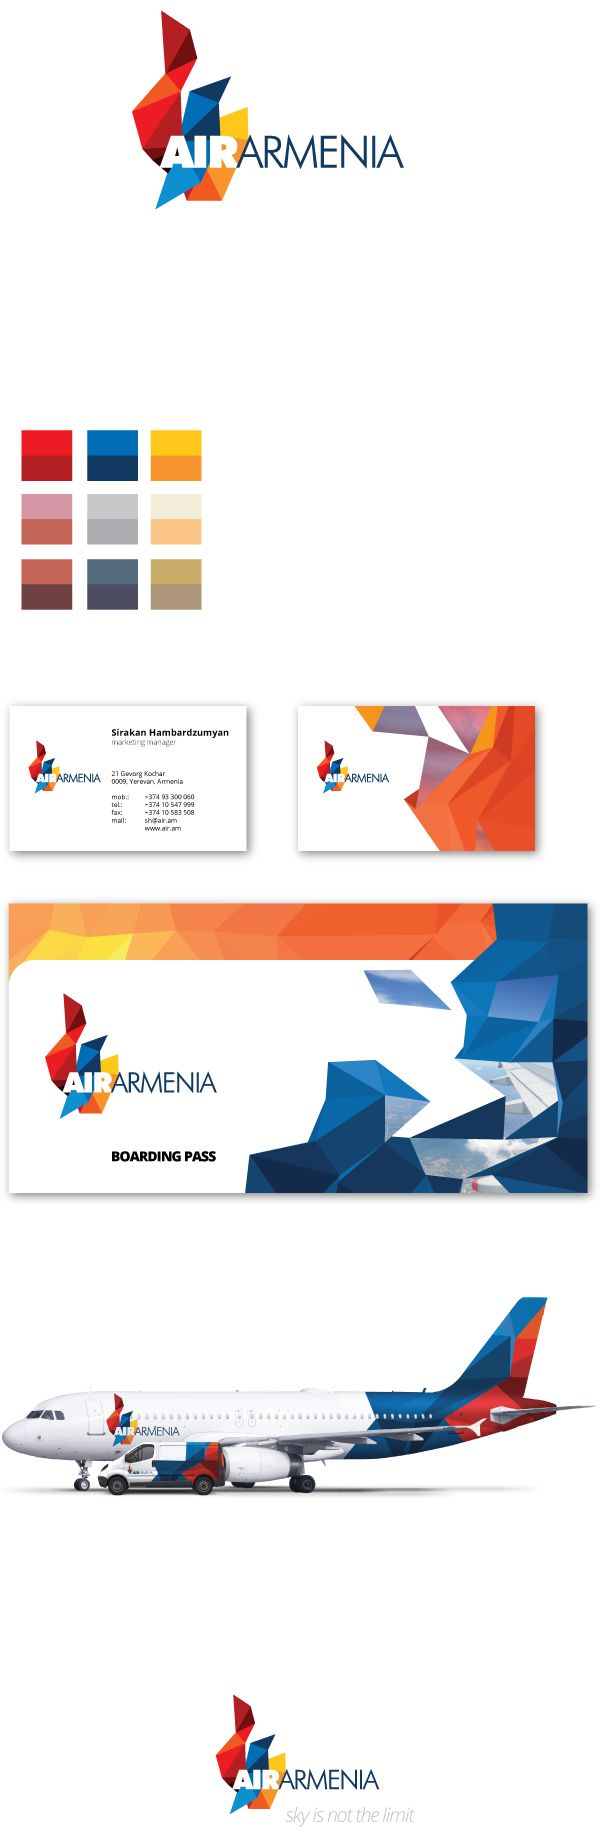 Air Armenia re-branding proposal by Vahan Balasanyan, via Behance